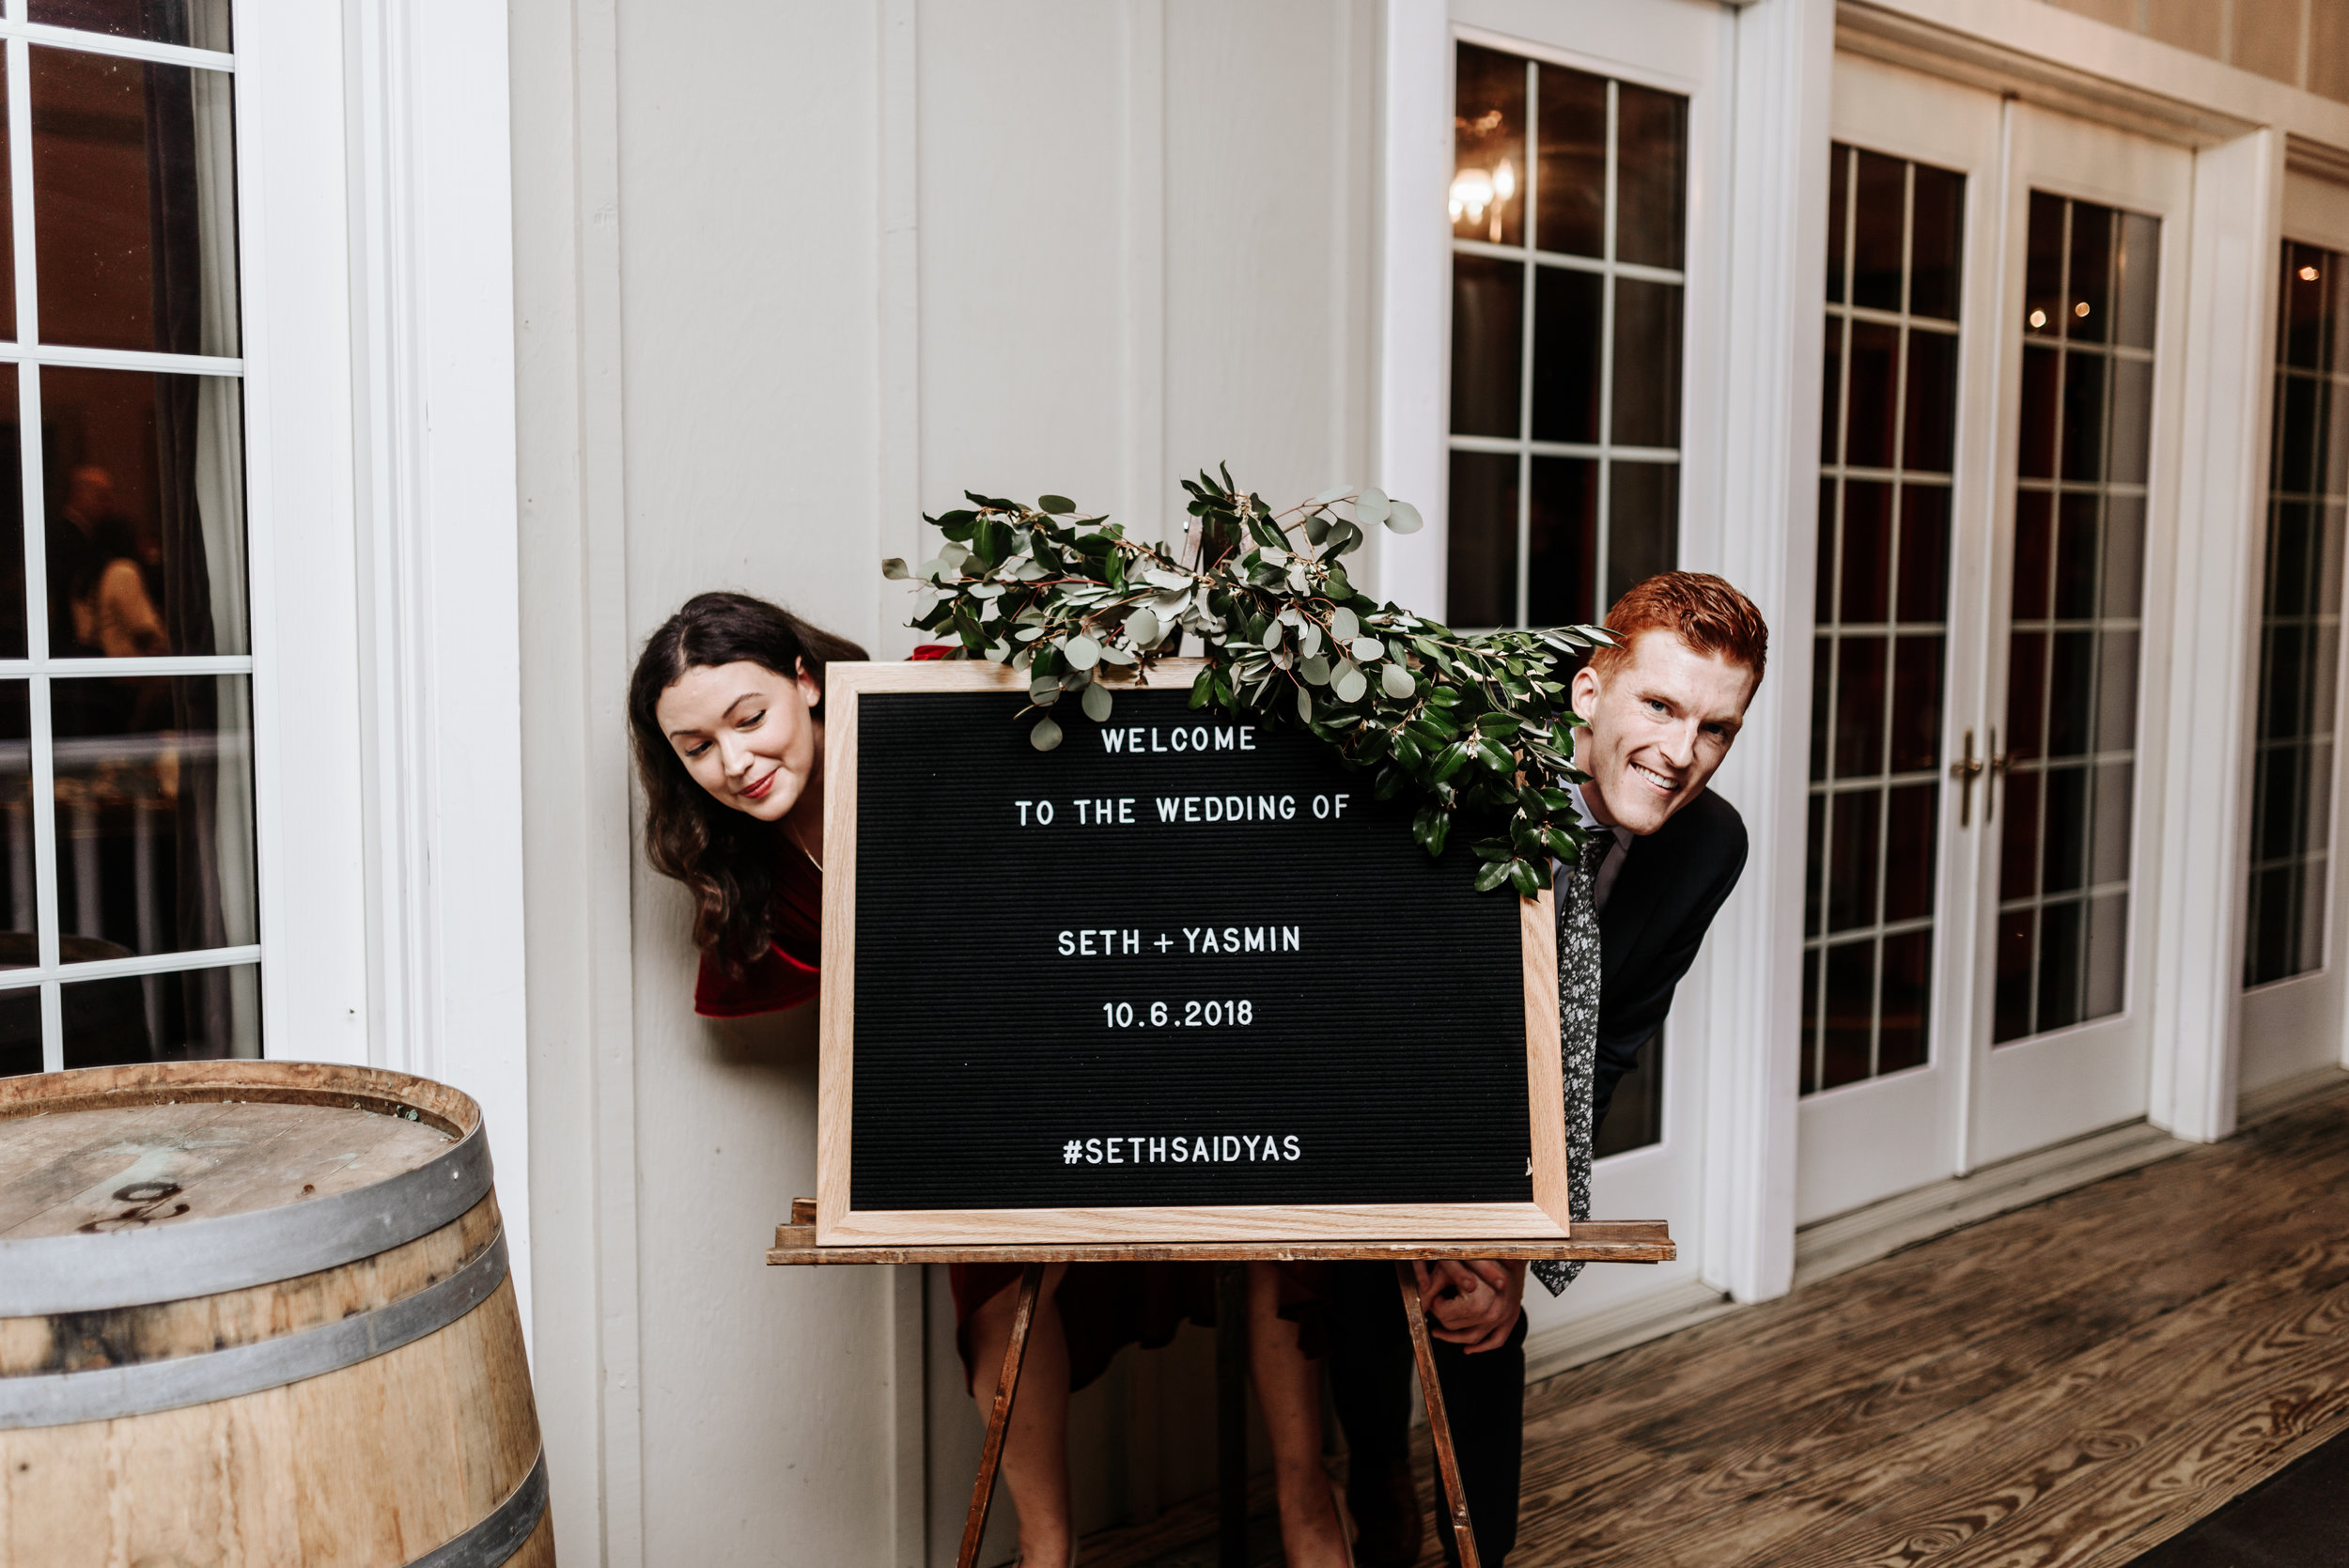 Veritas-Vineyards-and-Winery-Wedding-Photography-Afton-Virginia-Yasmin-Seth-Photography-by-V-9820.jpg